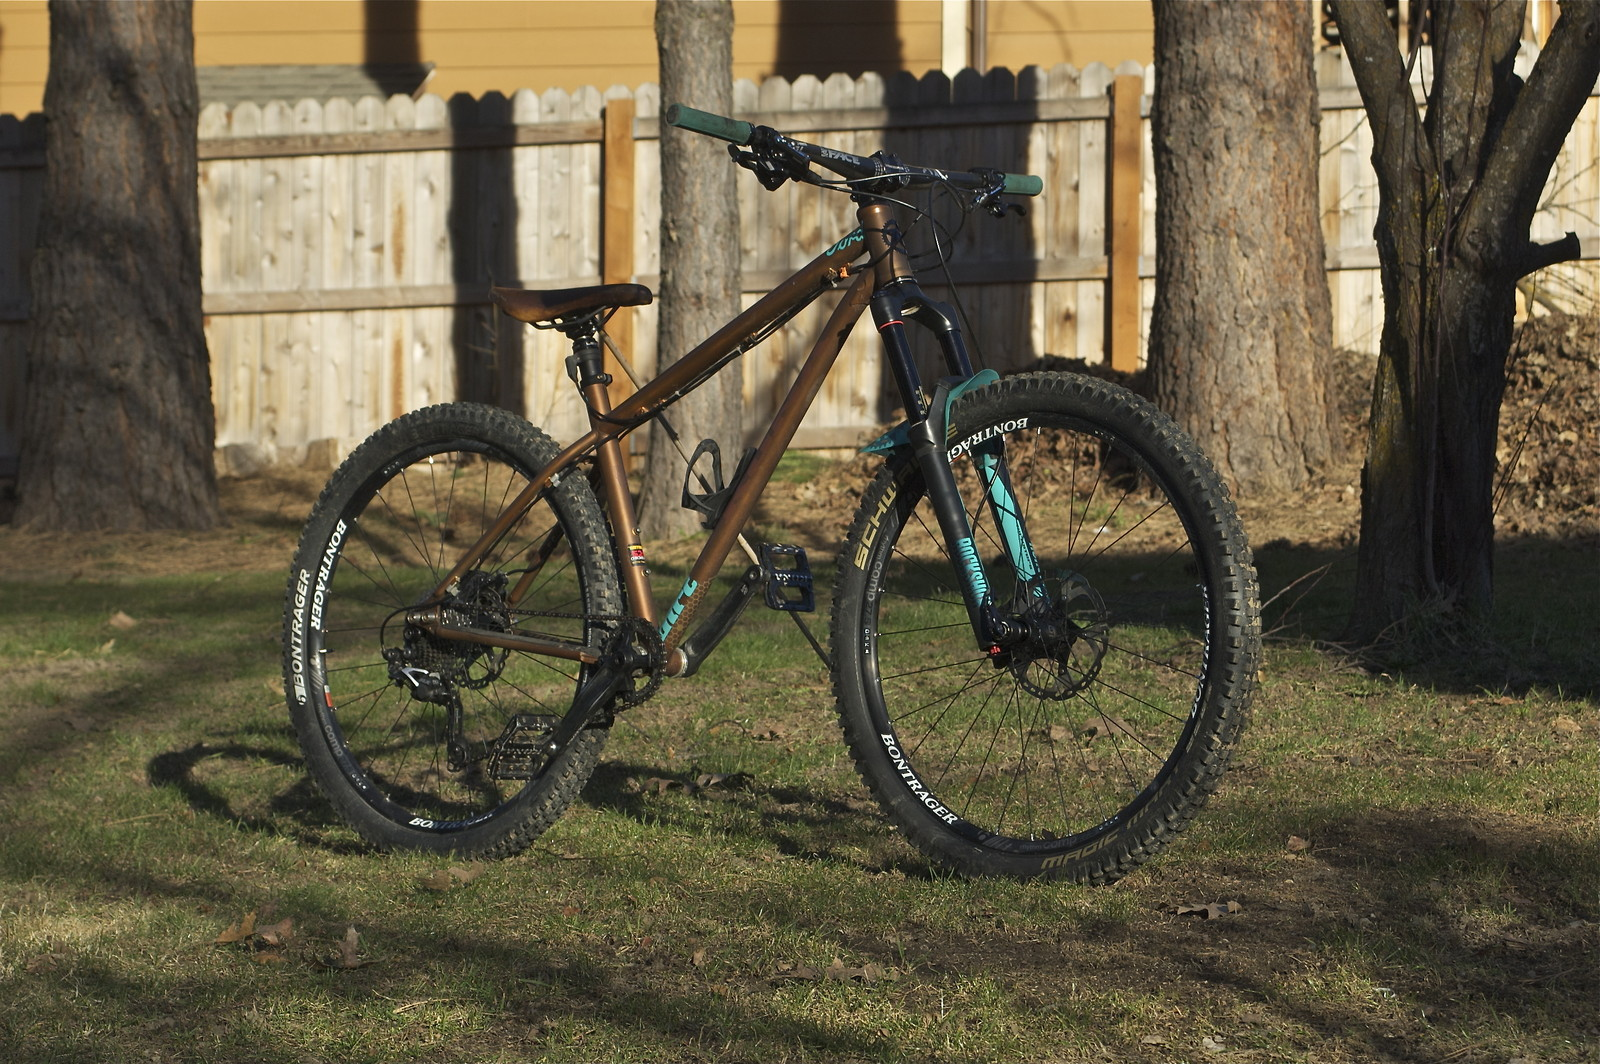 Explosif MTB/ Kona 2014 - TOMFORD\'s Bike Check - Vital MTB